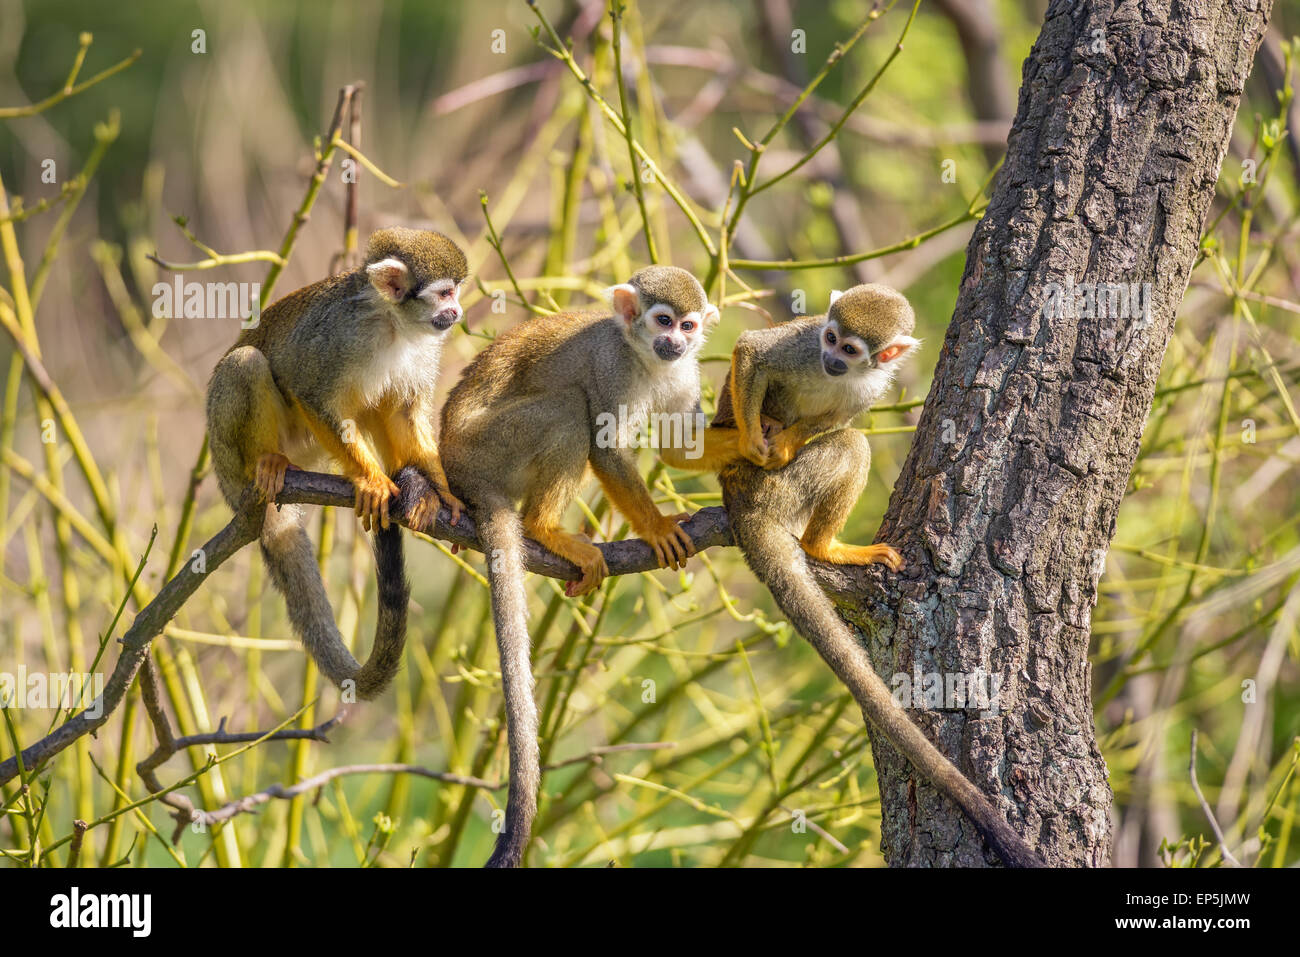 Three common squirrel monkeys (Saimiri sciureus) playing on a tree branch - Stock Image